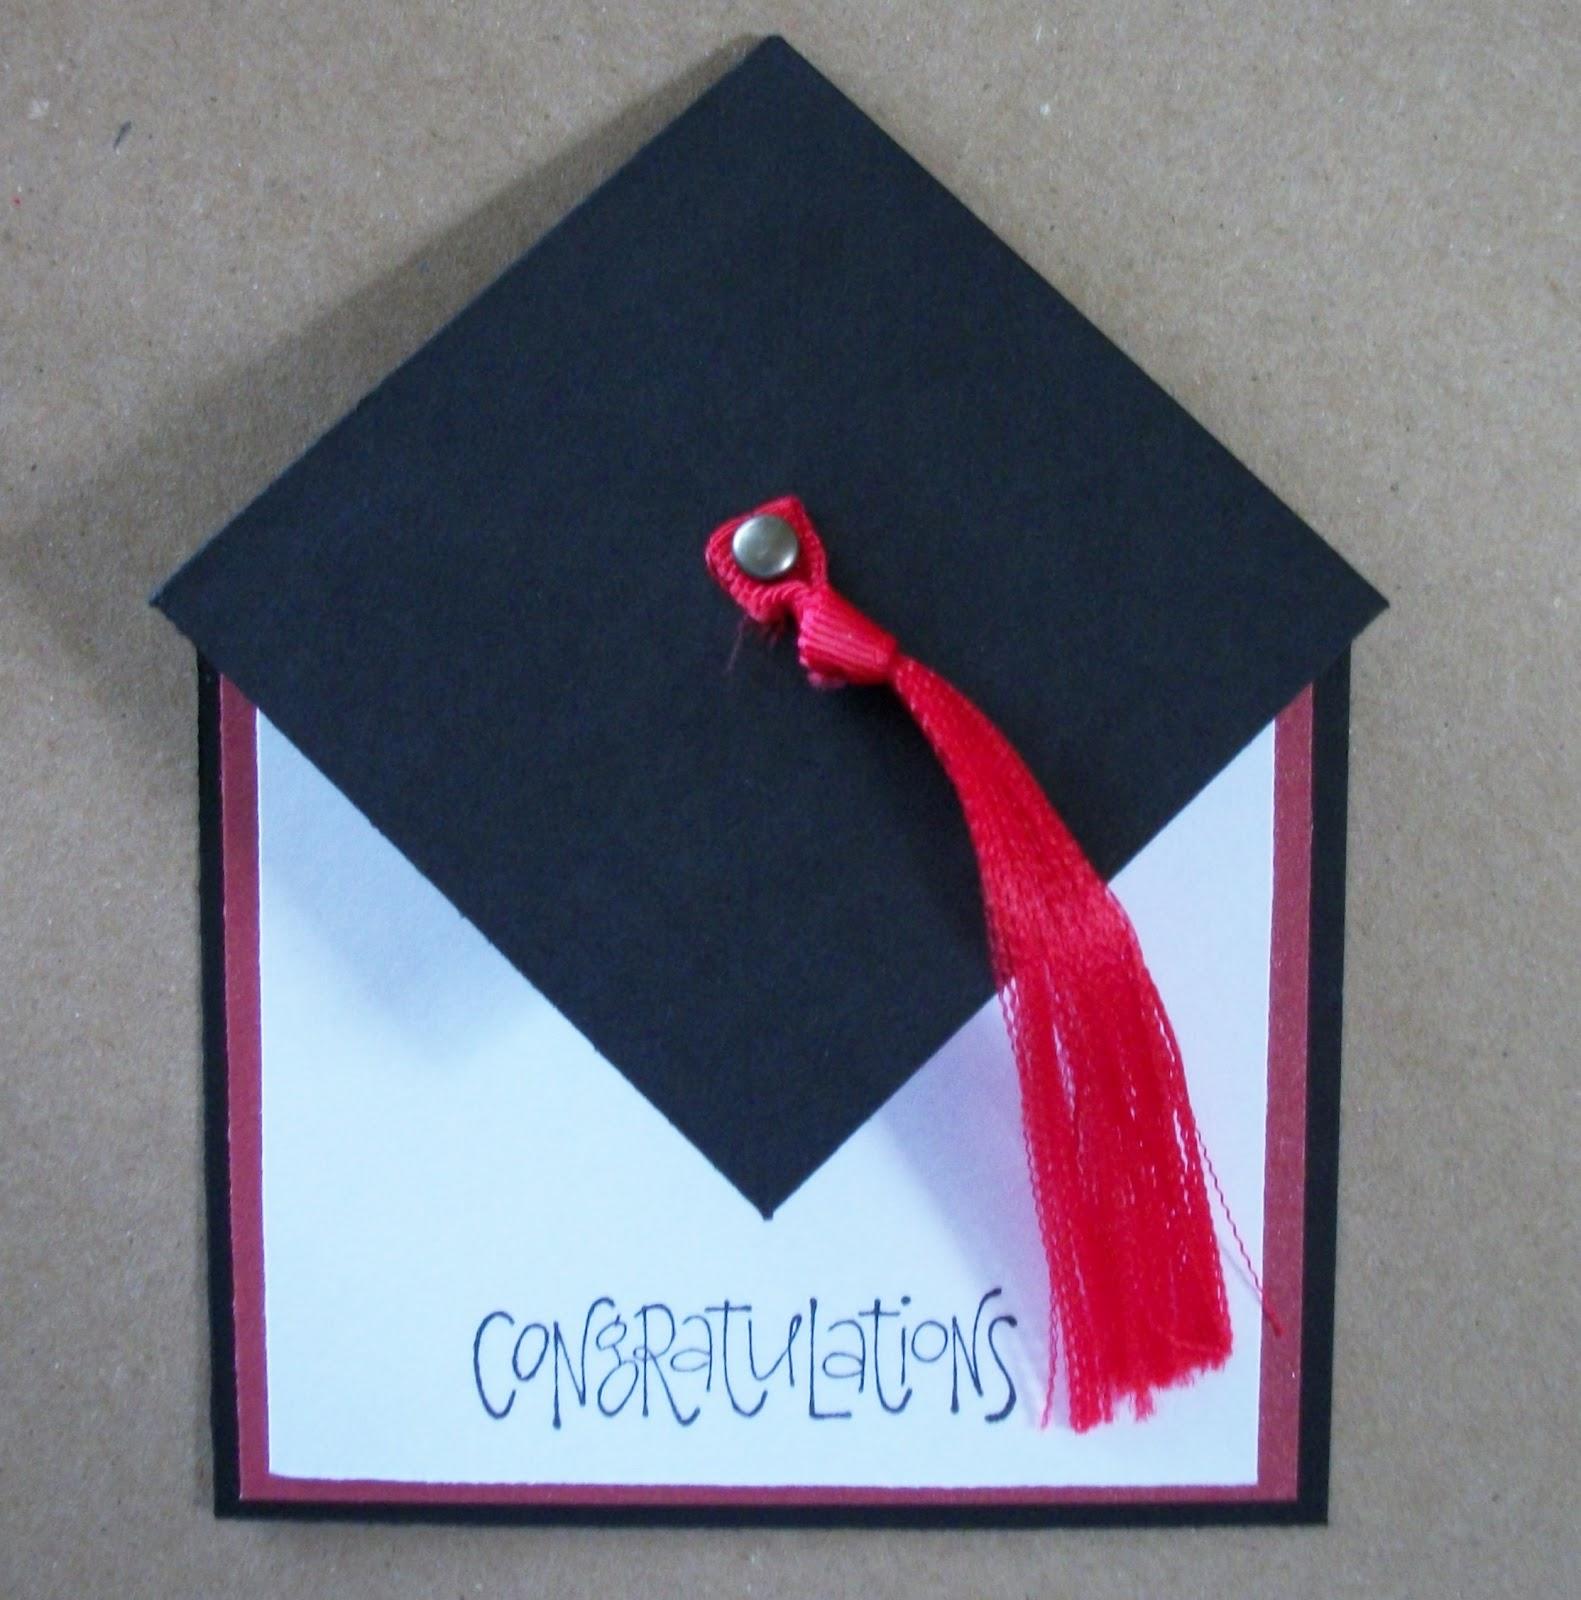 peace love joy and paper graduation hat card